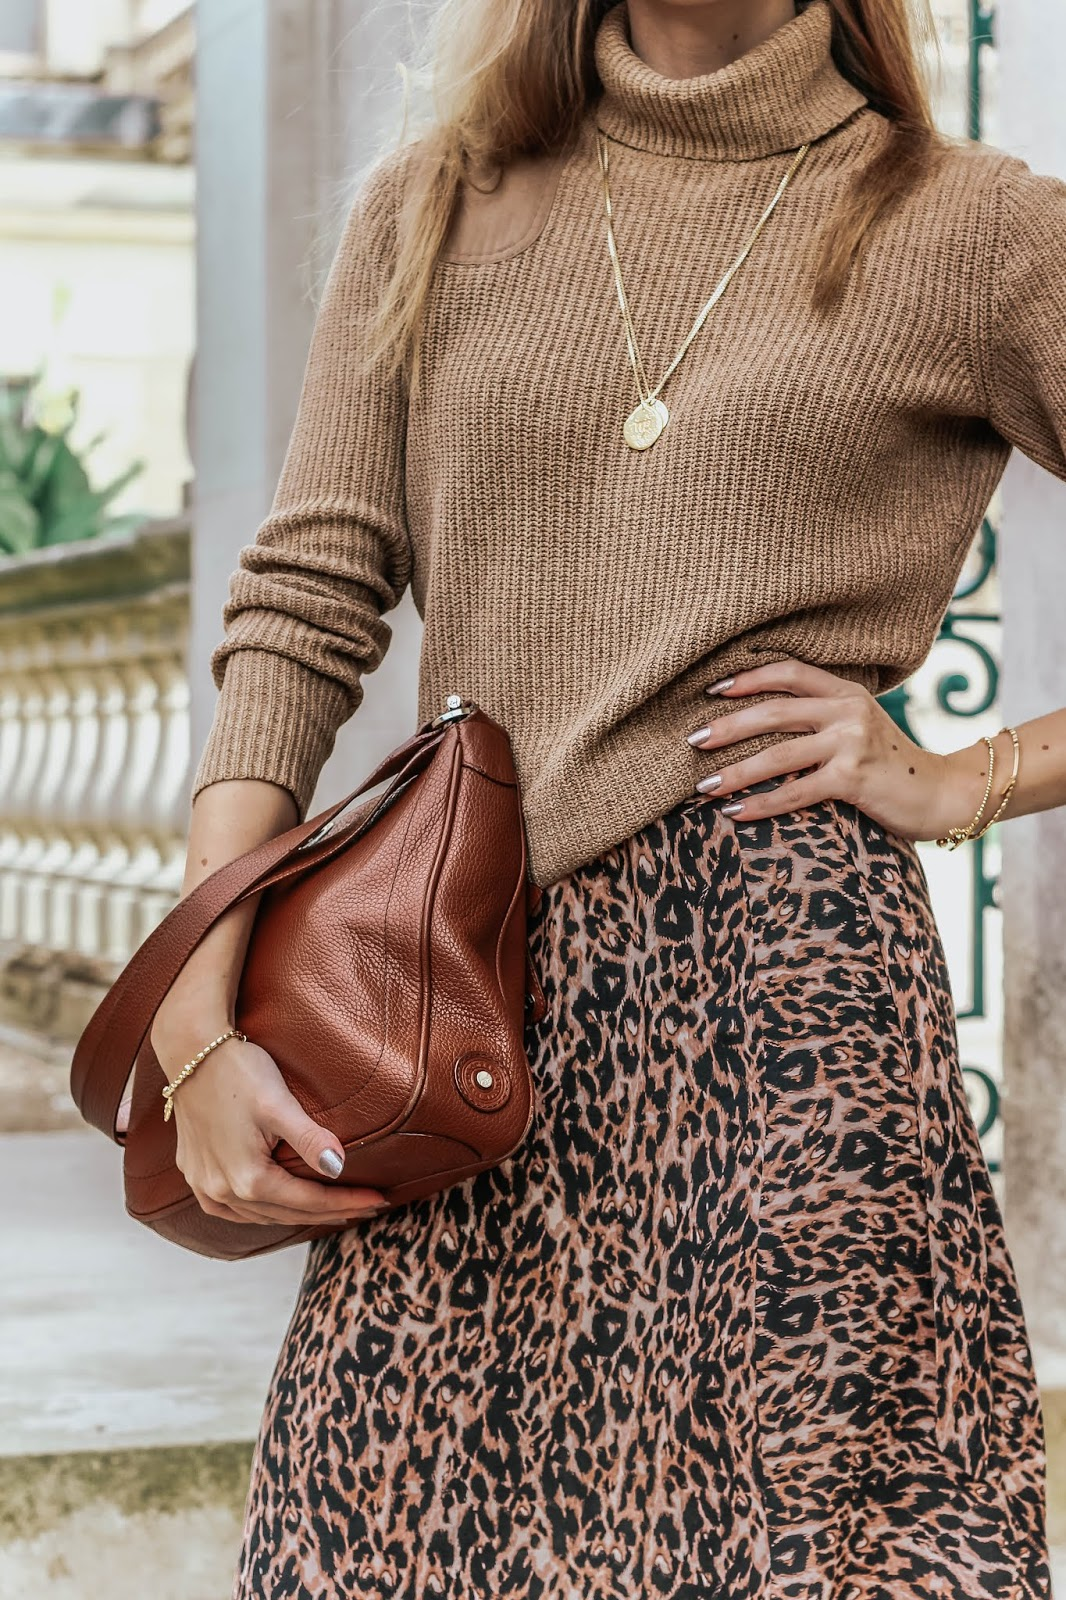 How to wear animal leopard print this season